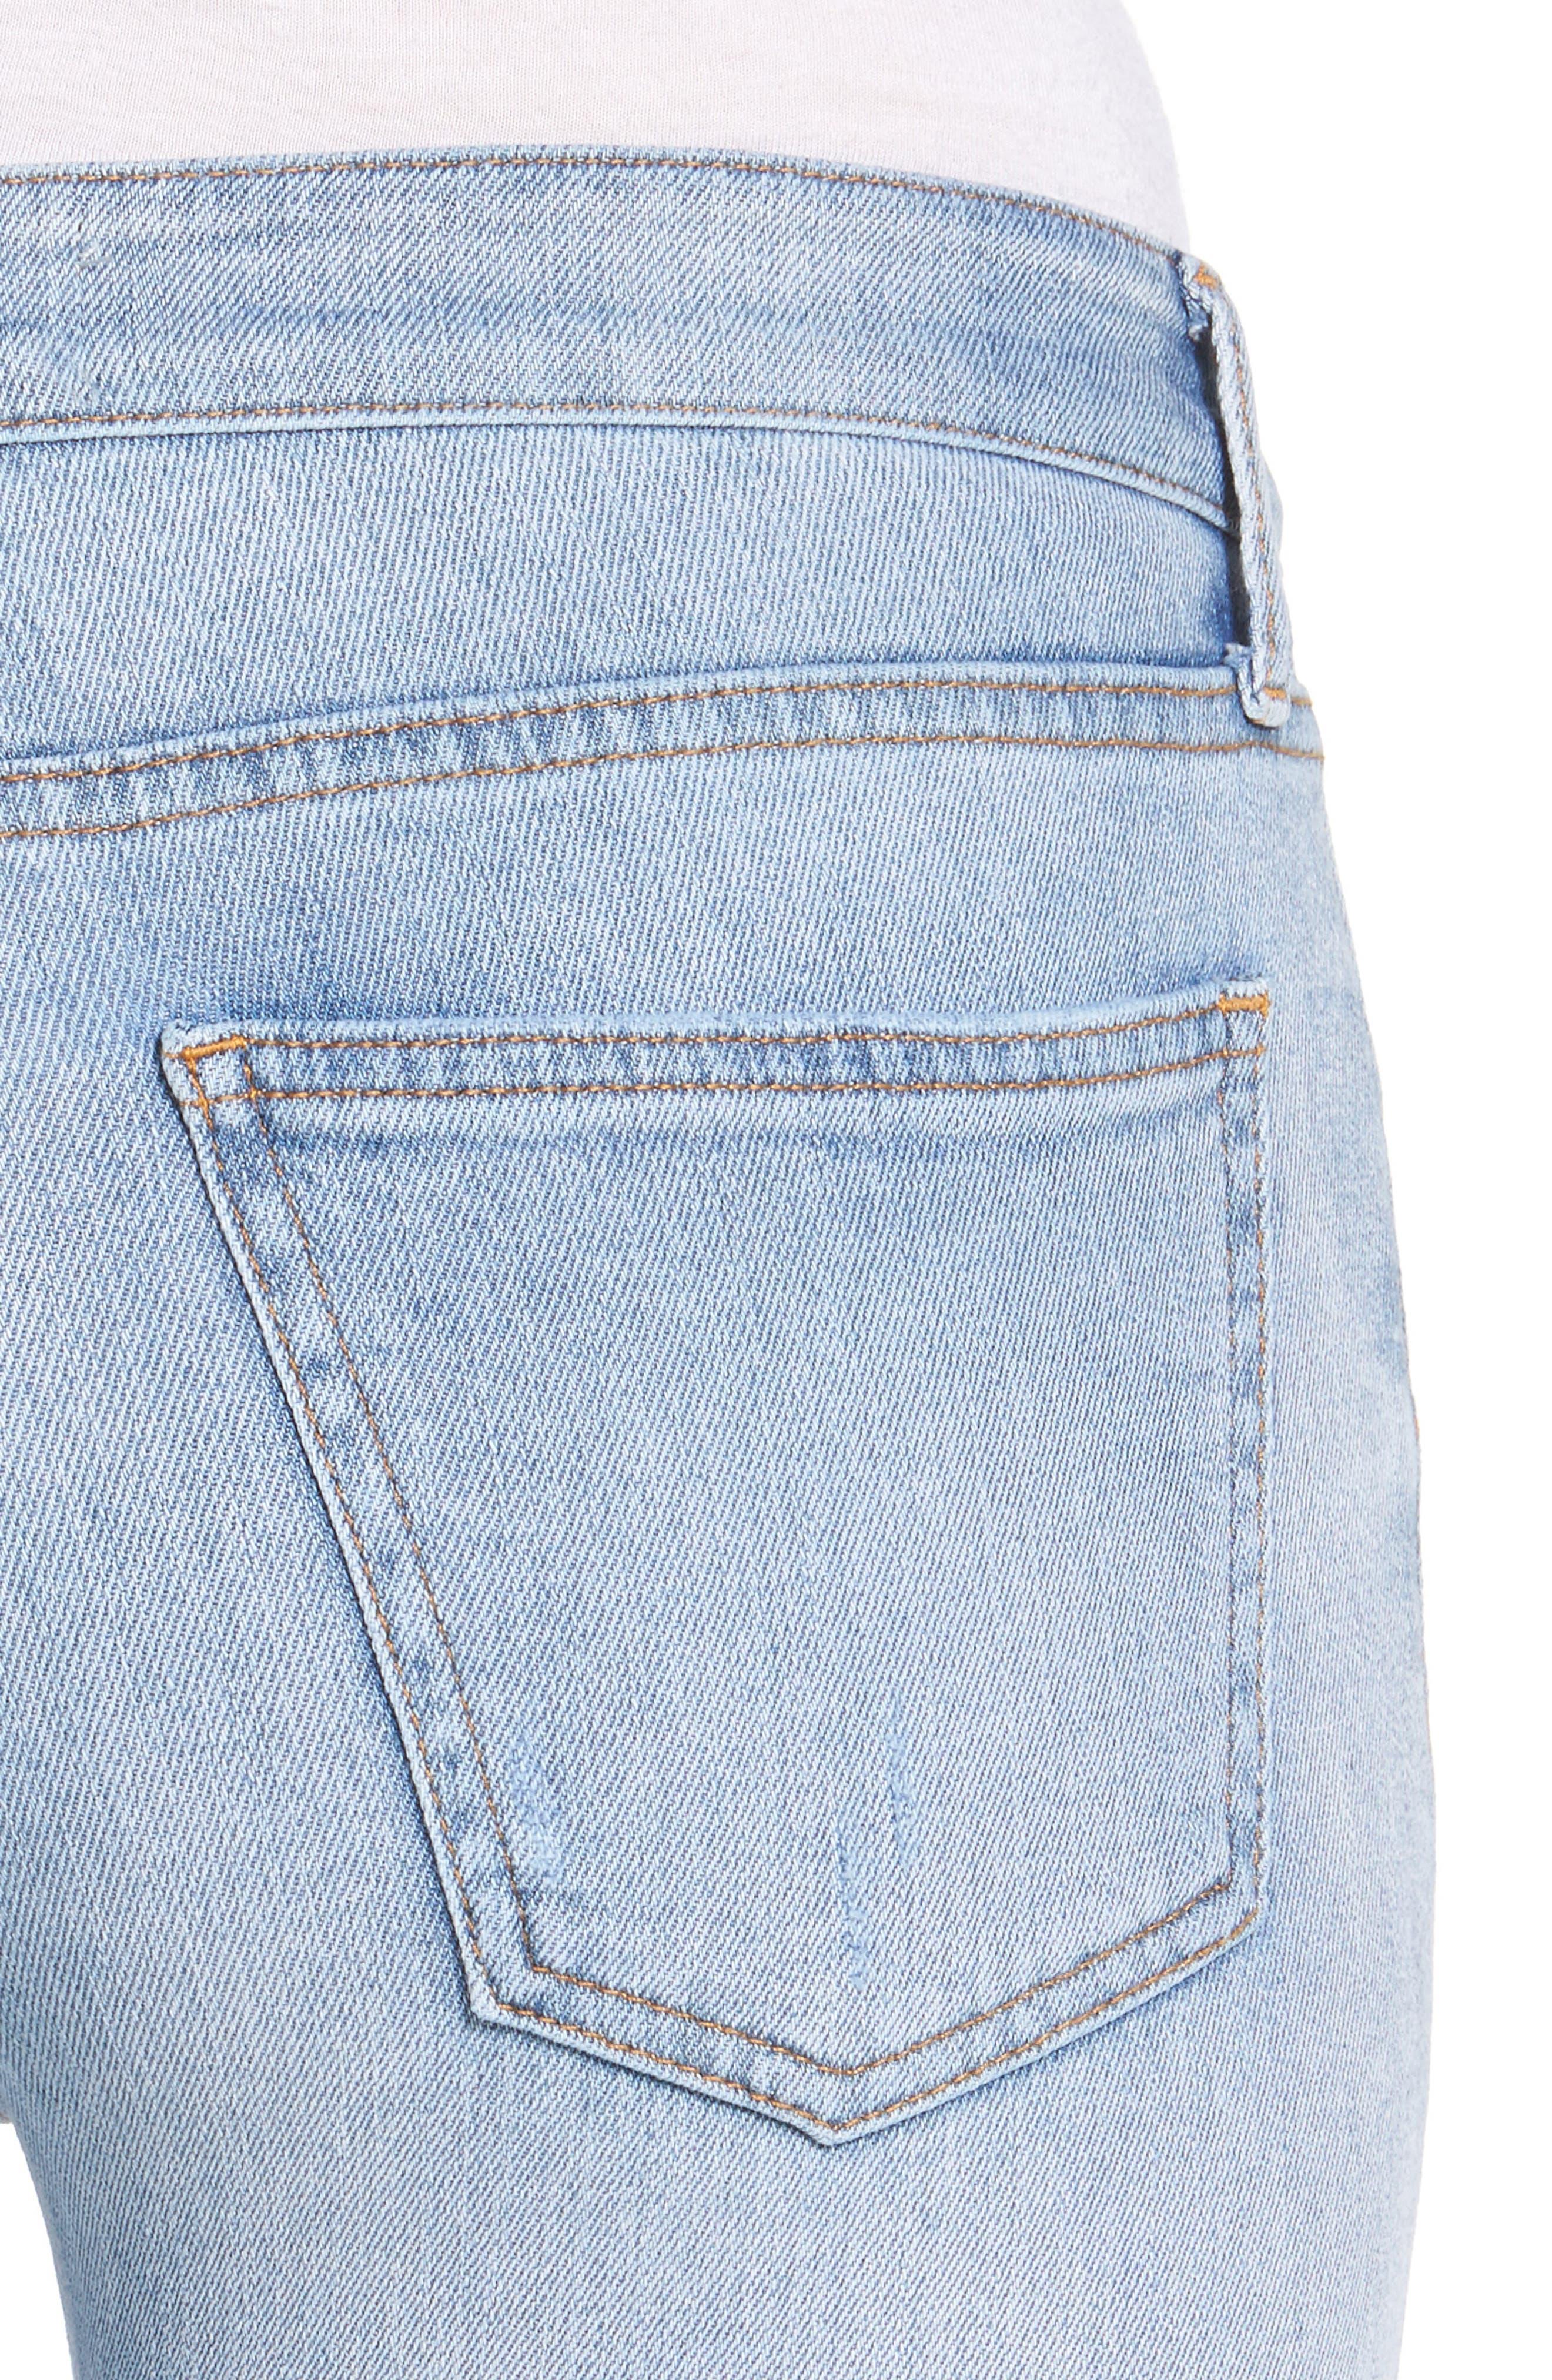 Frayed Hem Ankle Skinny Jeans,                             Alternate thumbnail 5, color,                             Denim Blue